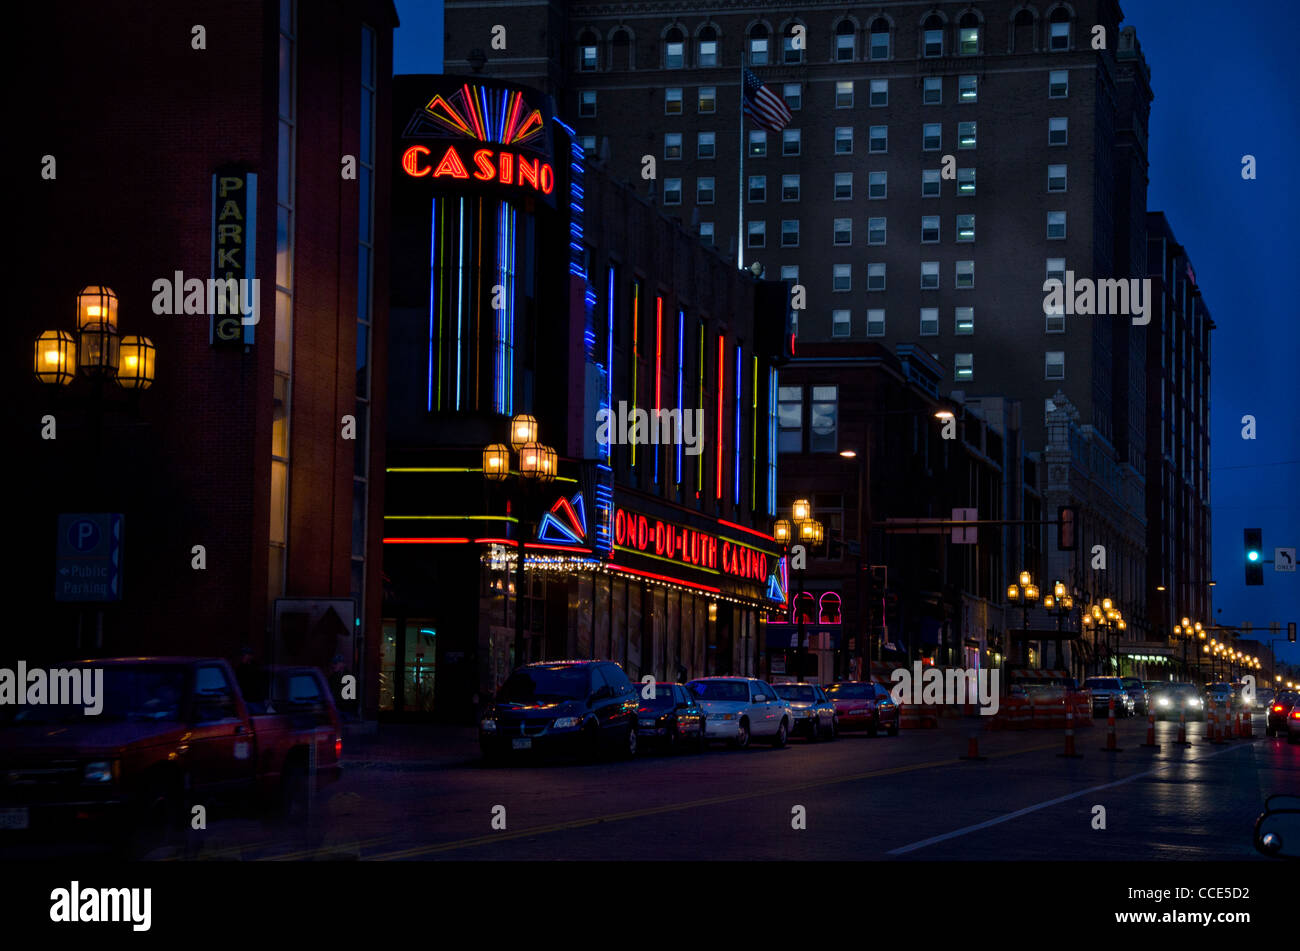 Fond-Du-Luth Casino in Duluth, Minnesota at night - Stock Image